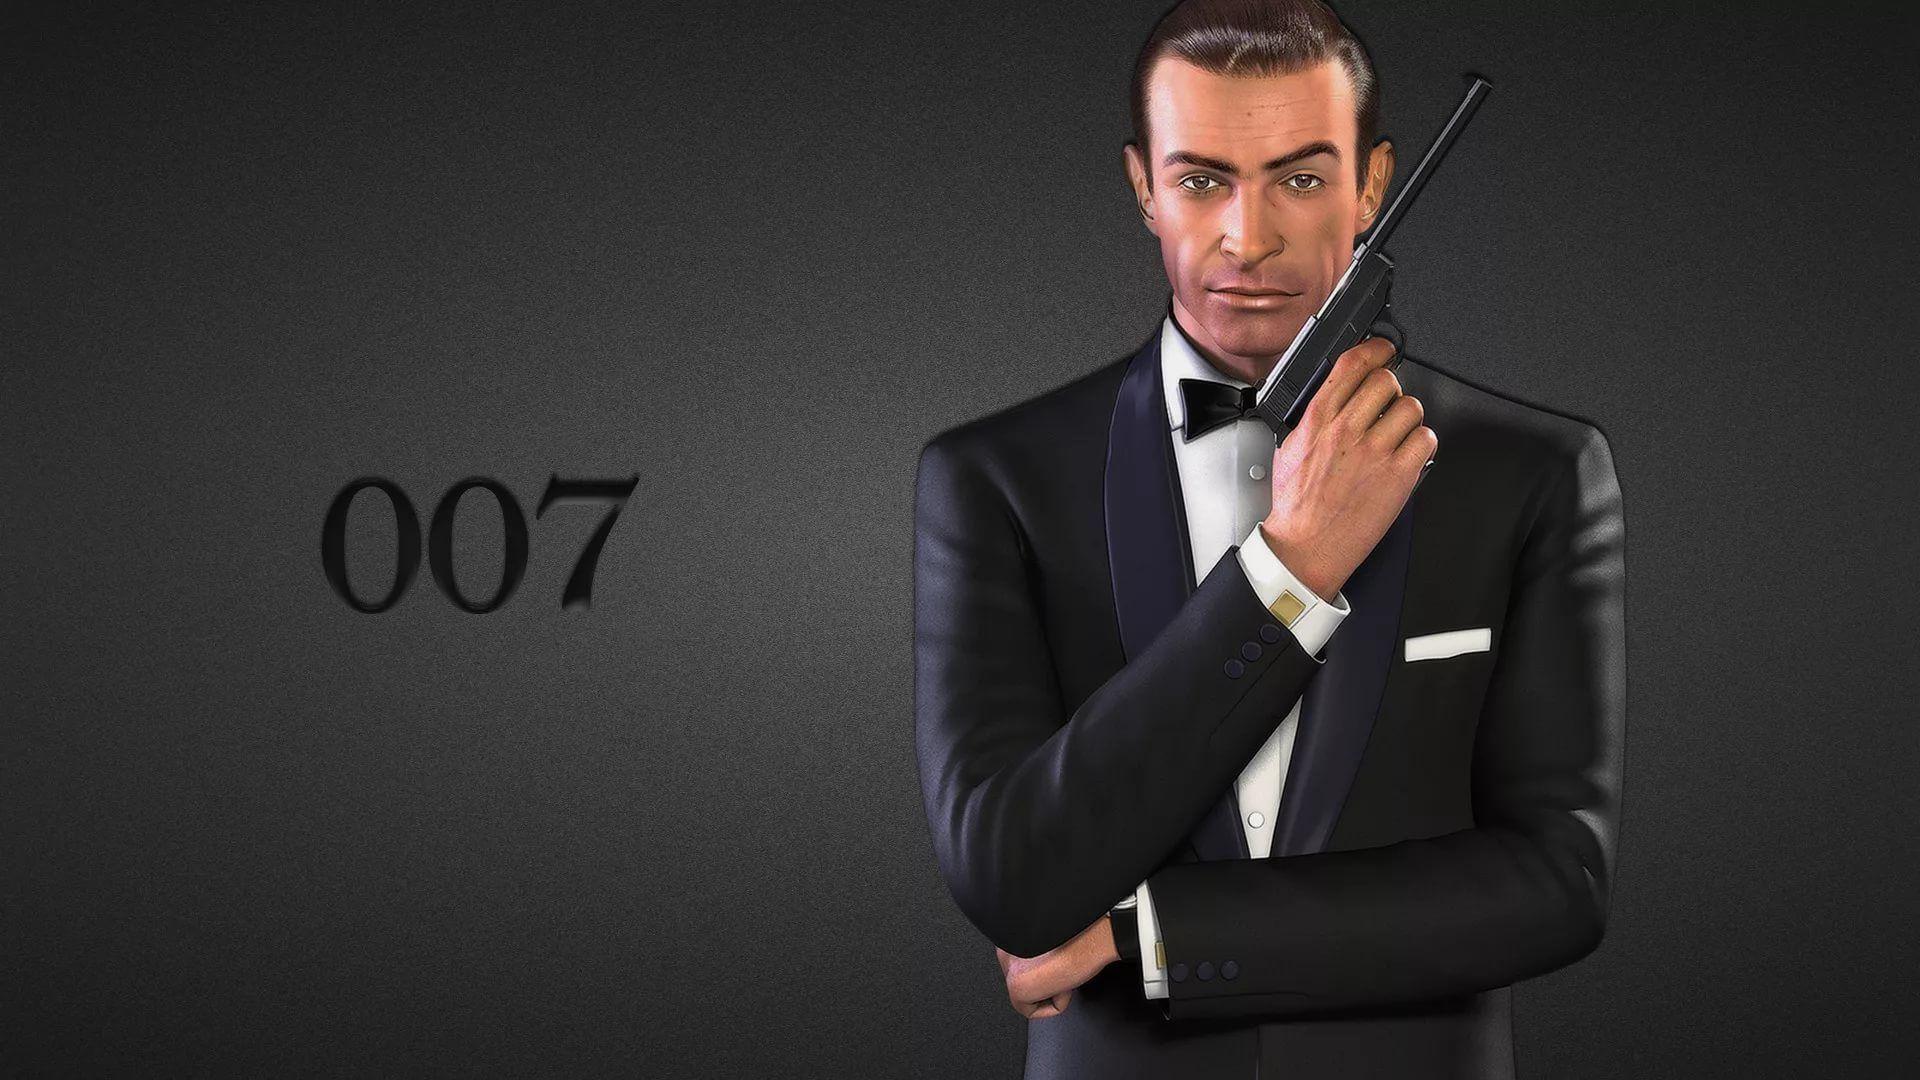 James Bond download free wallpaper image search